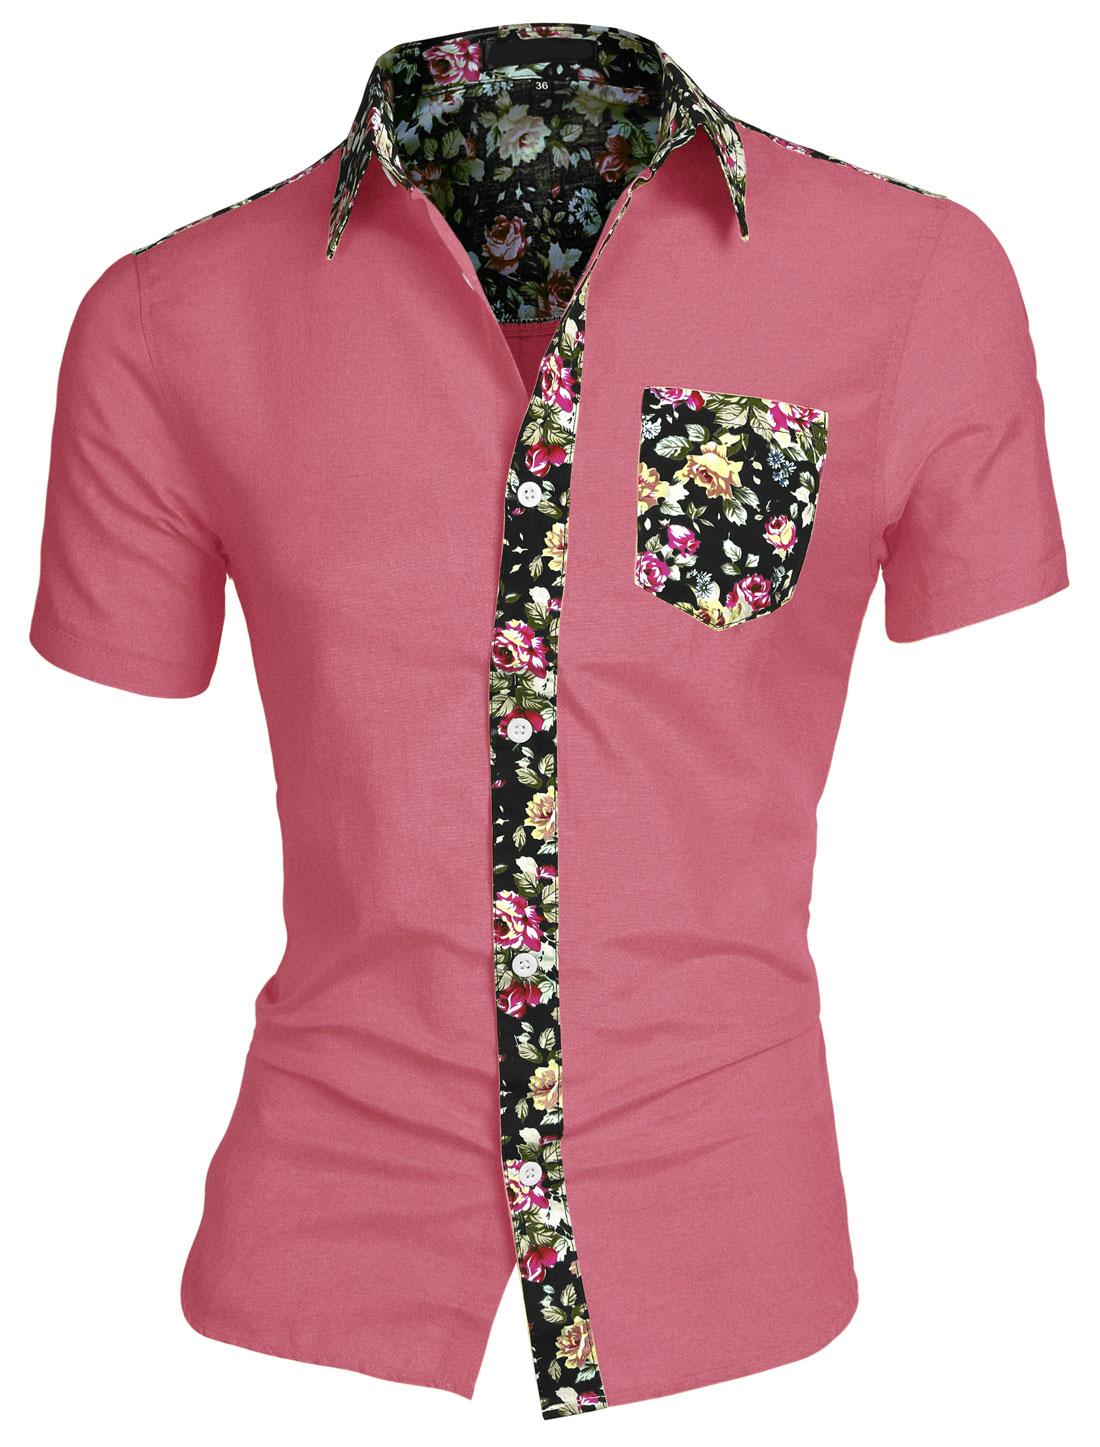 Mens Short Sleeve Point Collar Floral Print Slim Fit Shirts Fuchsia L